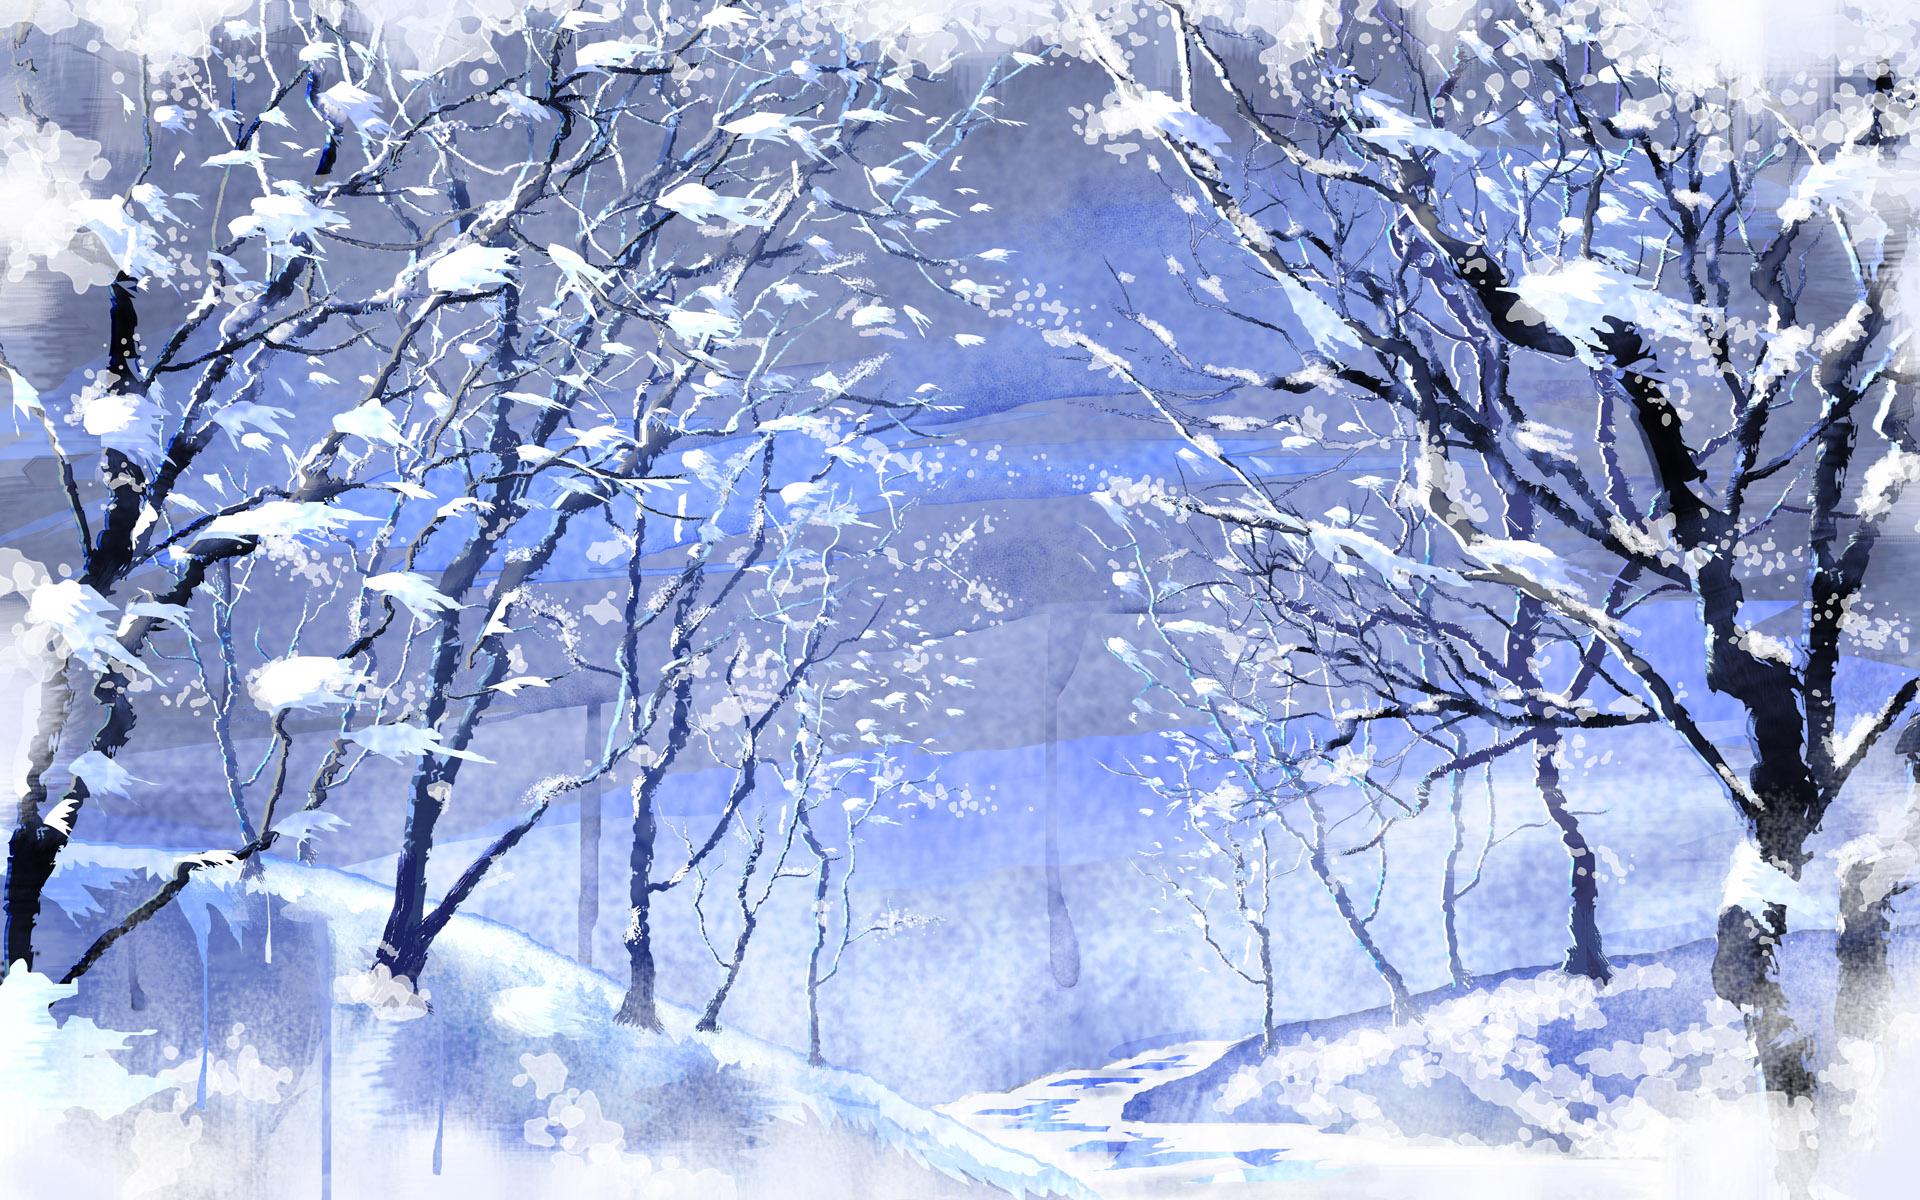 /free-winter-scene-wallpaper-download-the-free-winter-scene-wallpaper ...